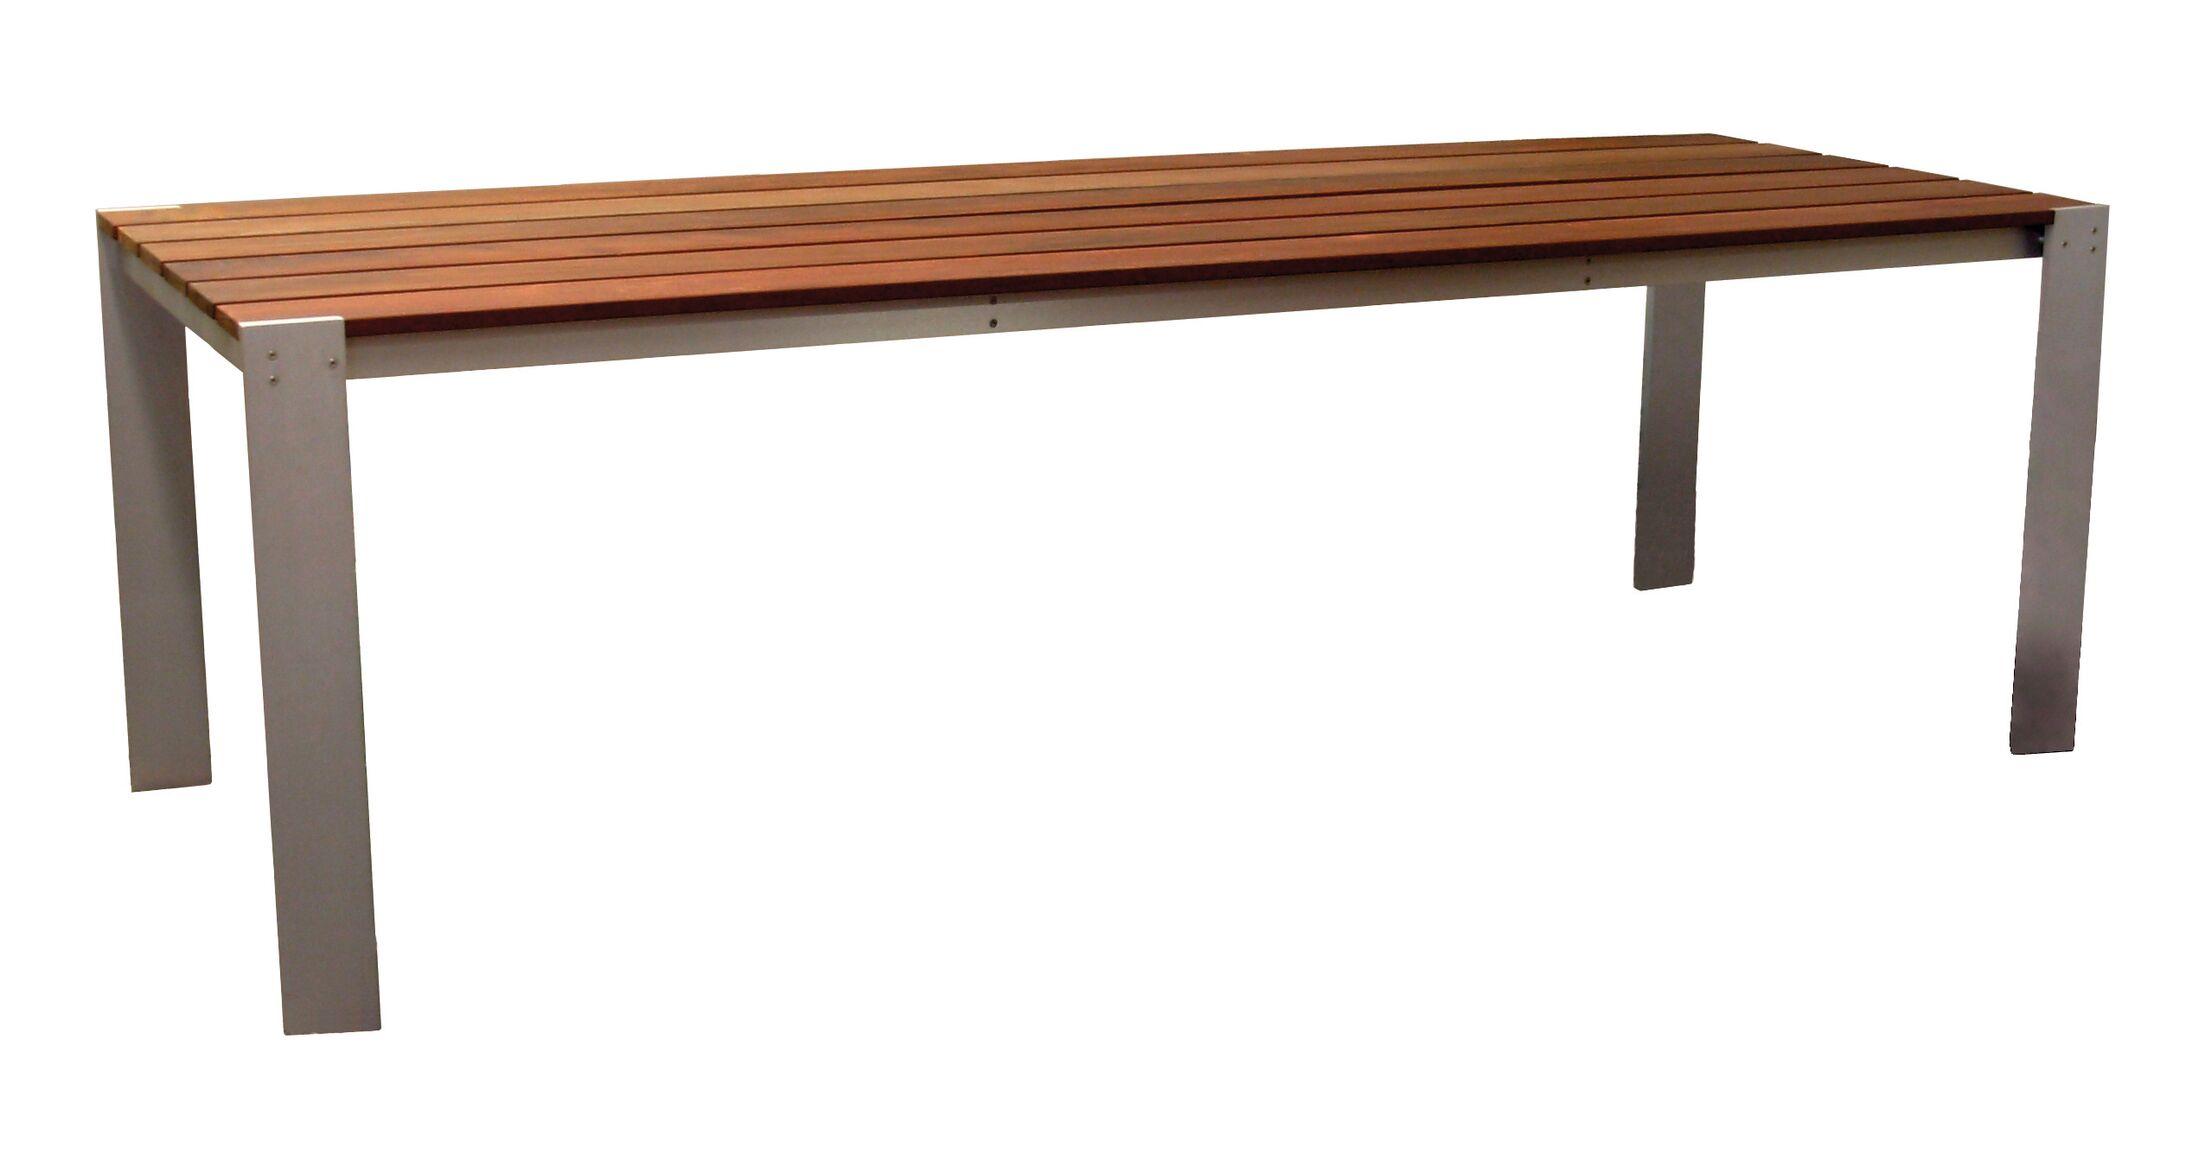 Luma Aluminum Dining Table Table Size: 54